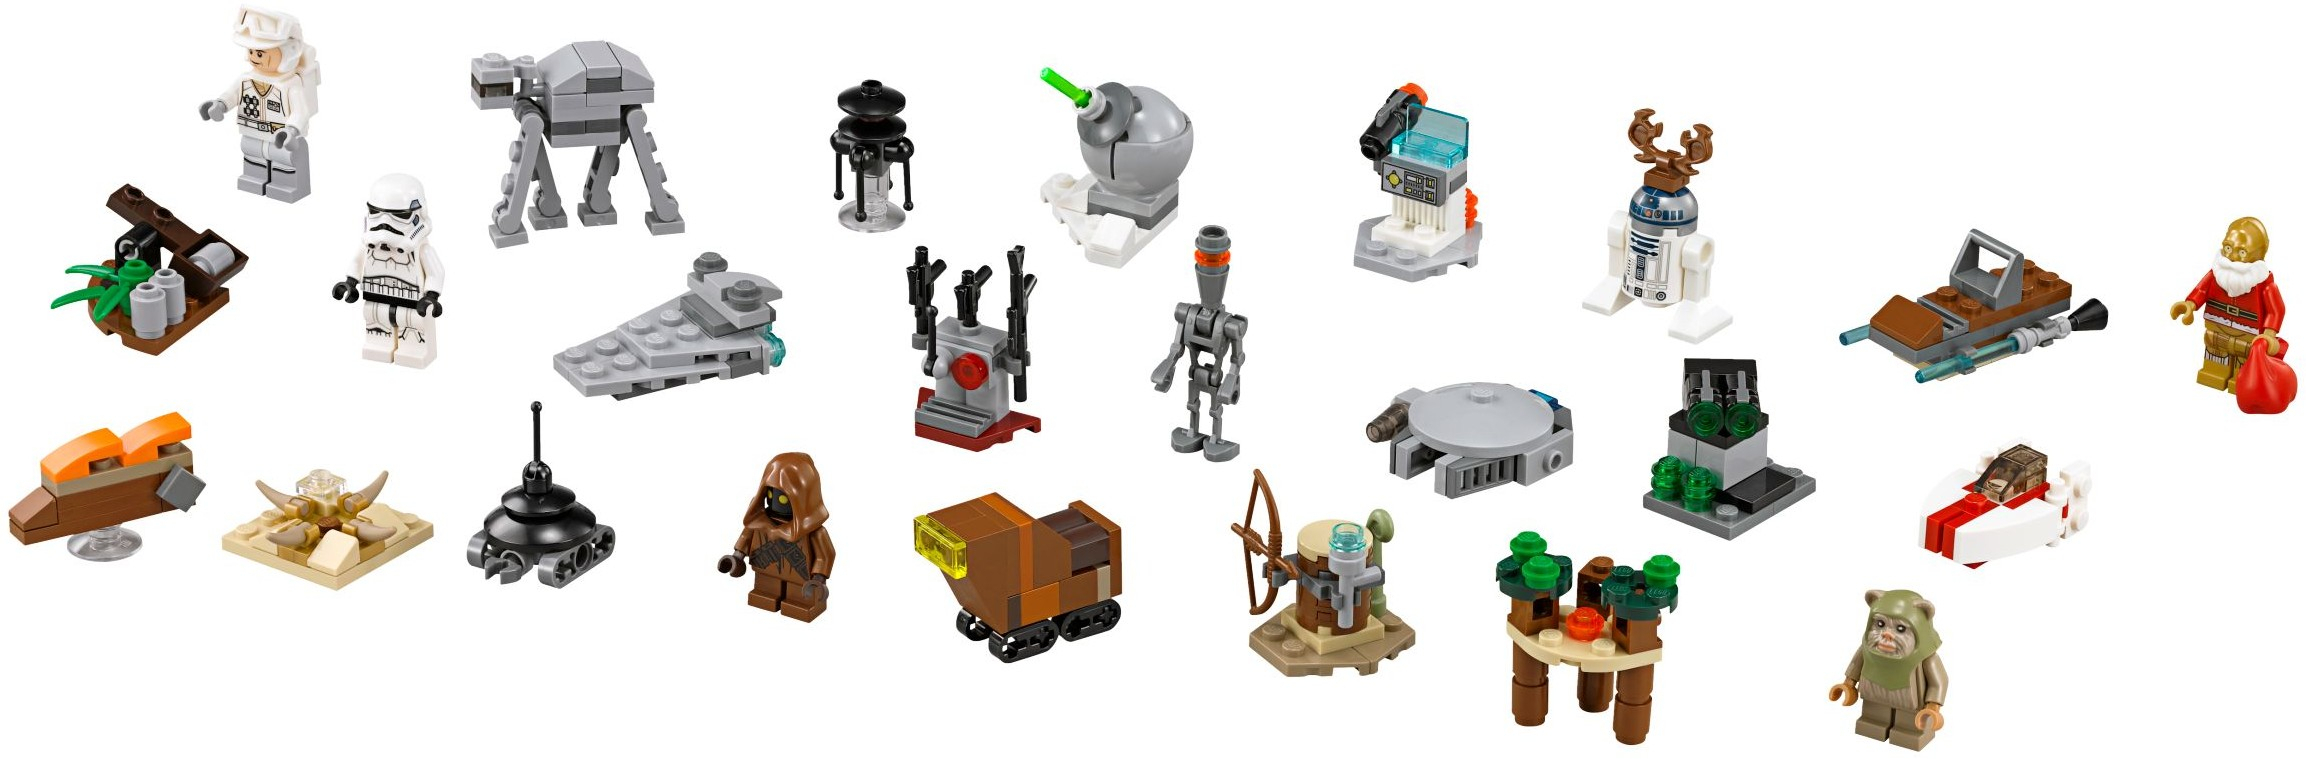 Лего 75097 Star Wars Advent Calendar with Lego 75213 Instructions